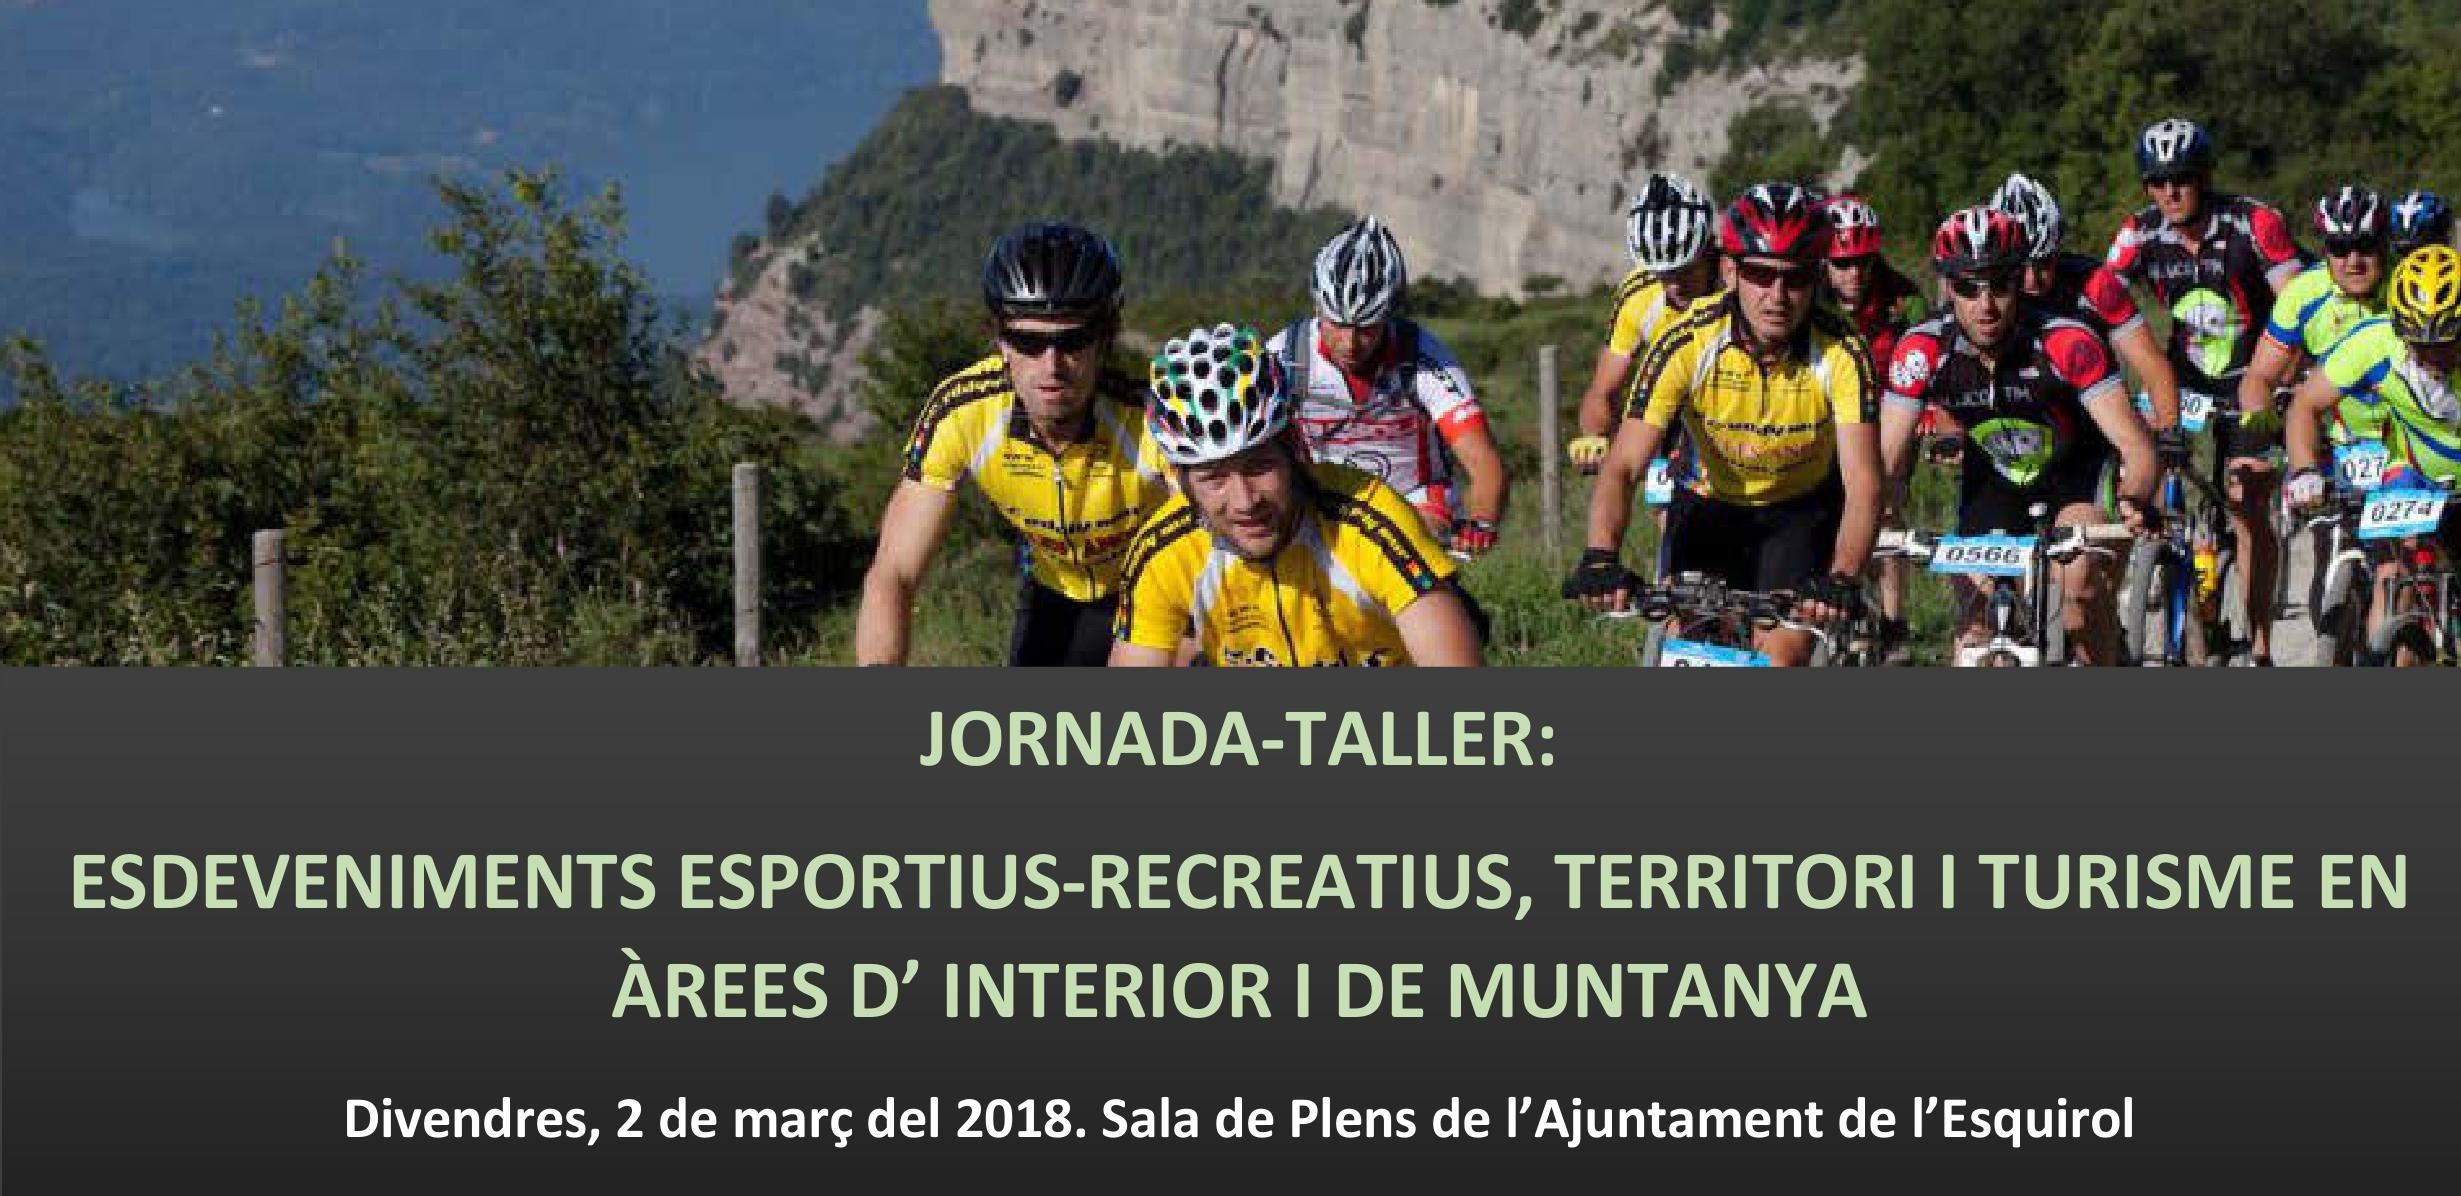 Jornada, Esdeveniments esportius-recreatius